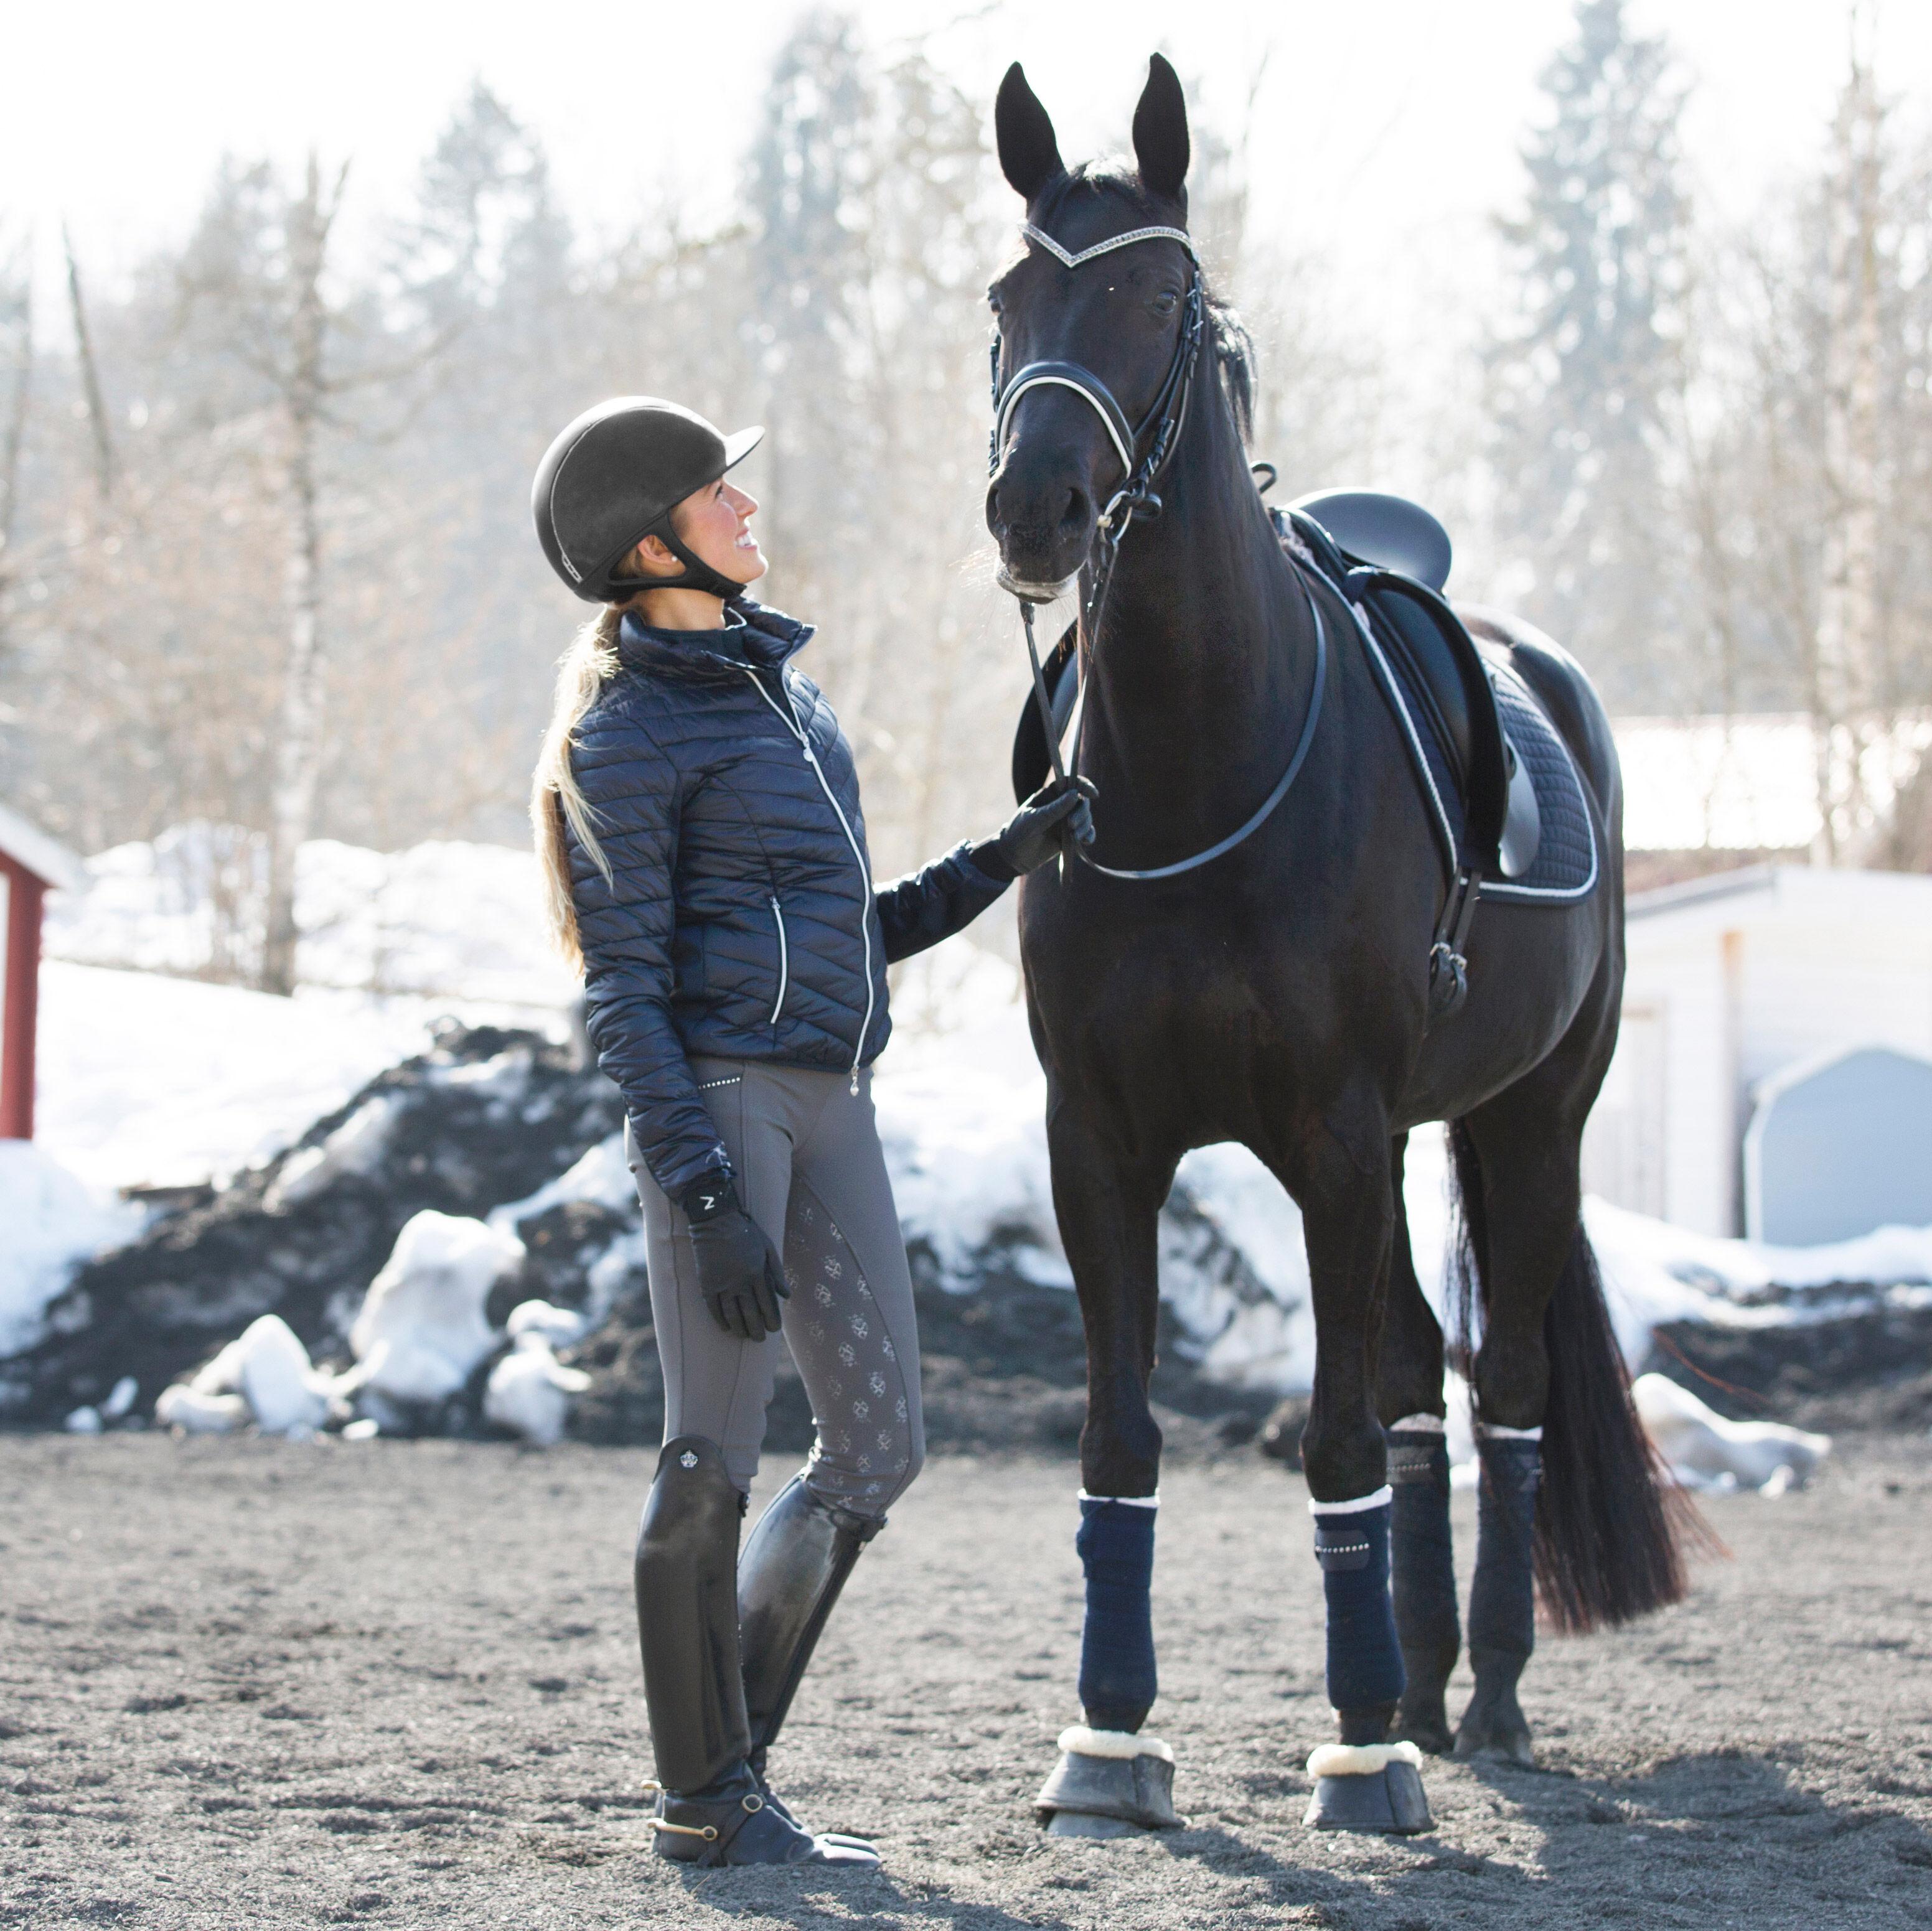 36219 Horze Crescendo Leah Women/'s Silicone Grip Riding Tights NEW